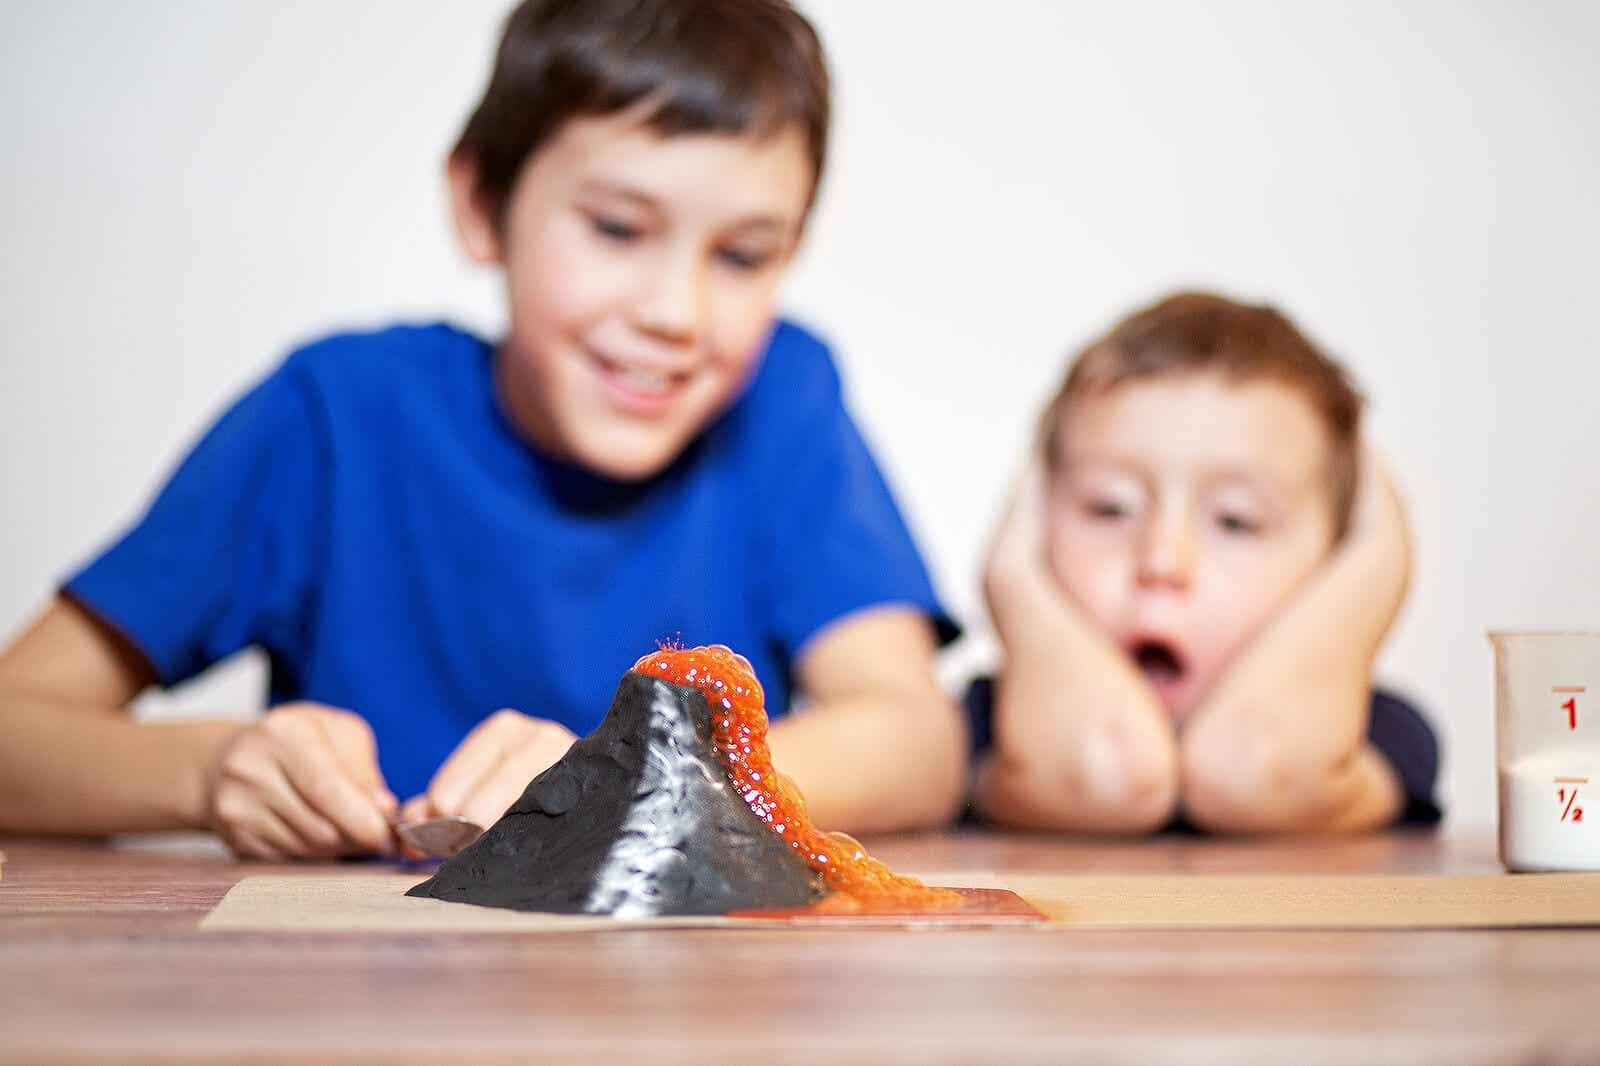 Children watching a homemade volcano erupt.